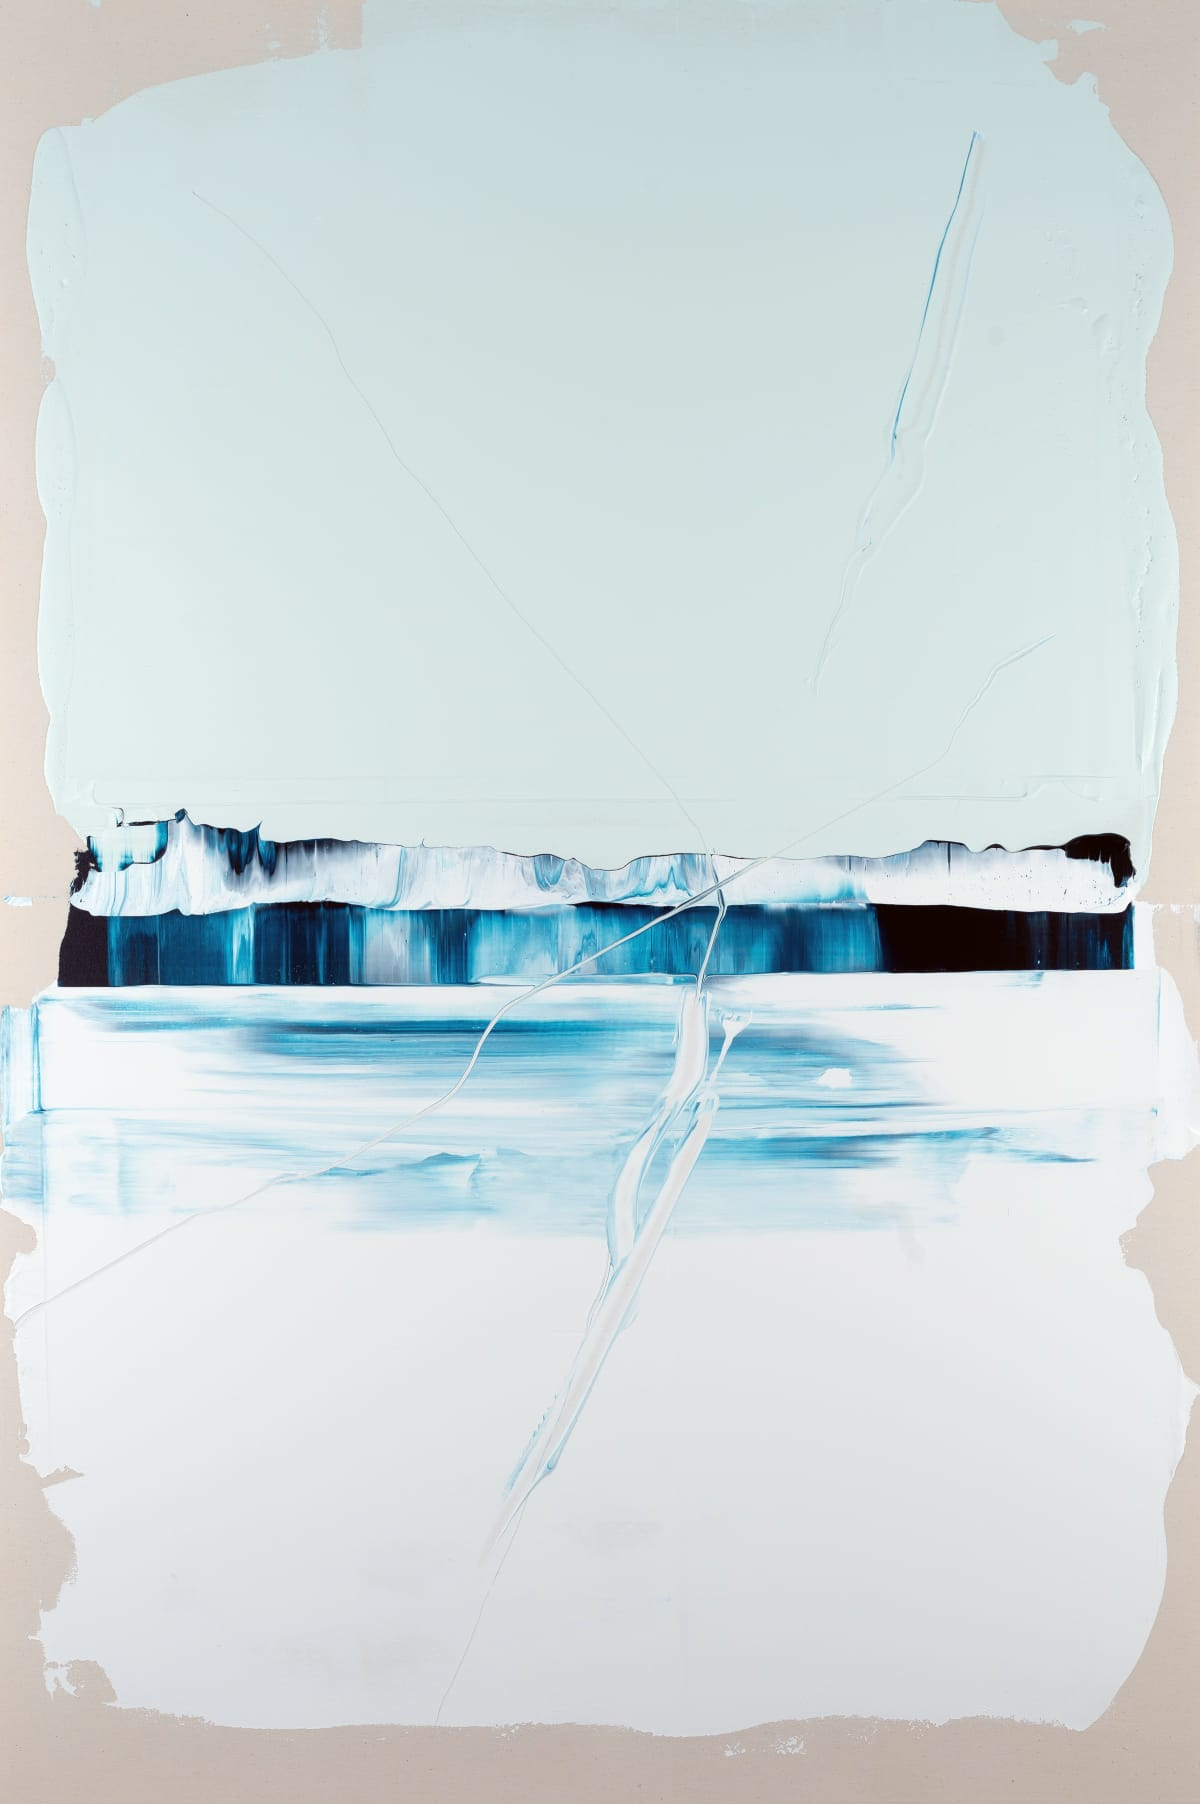 Alex Kuznetsov Horizons #3, 2019 Acrylic on Canvas 150 x 100 x 3 cm 59 1/8 x 39 3/8 x 1 1/8 in